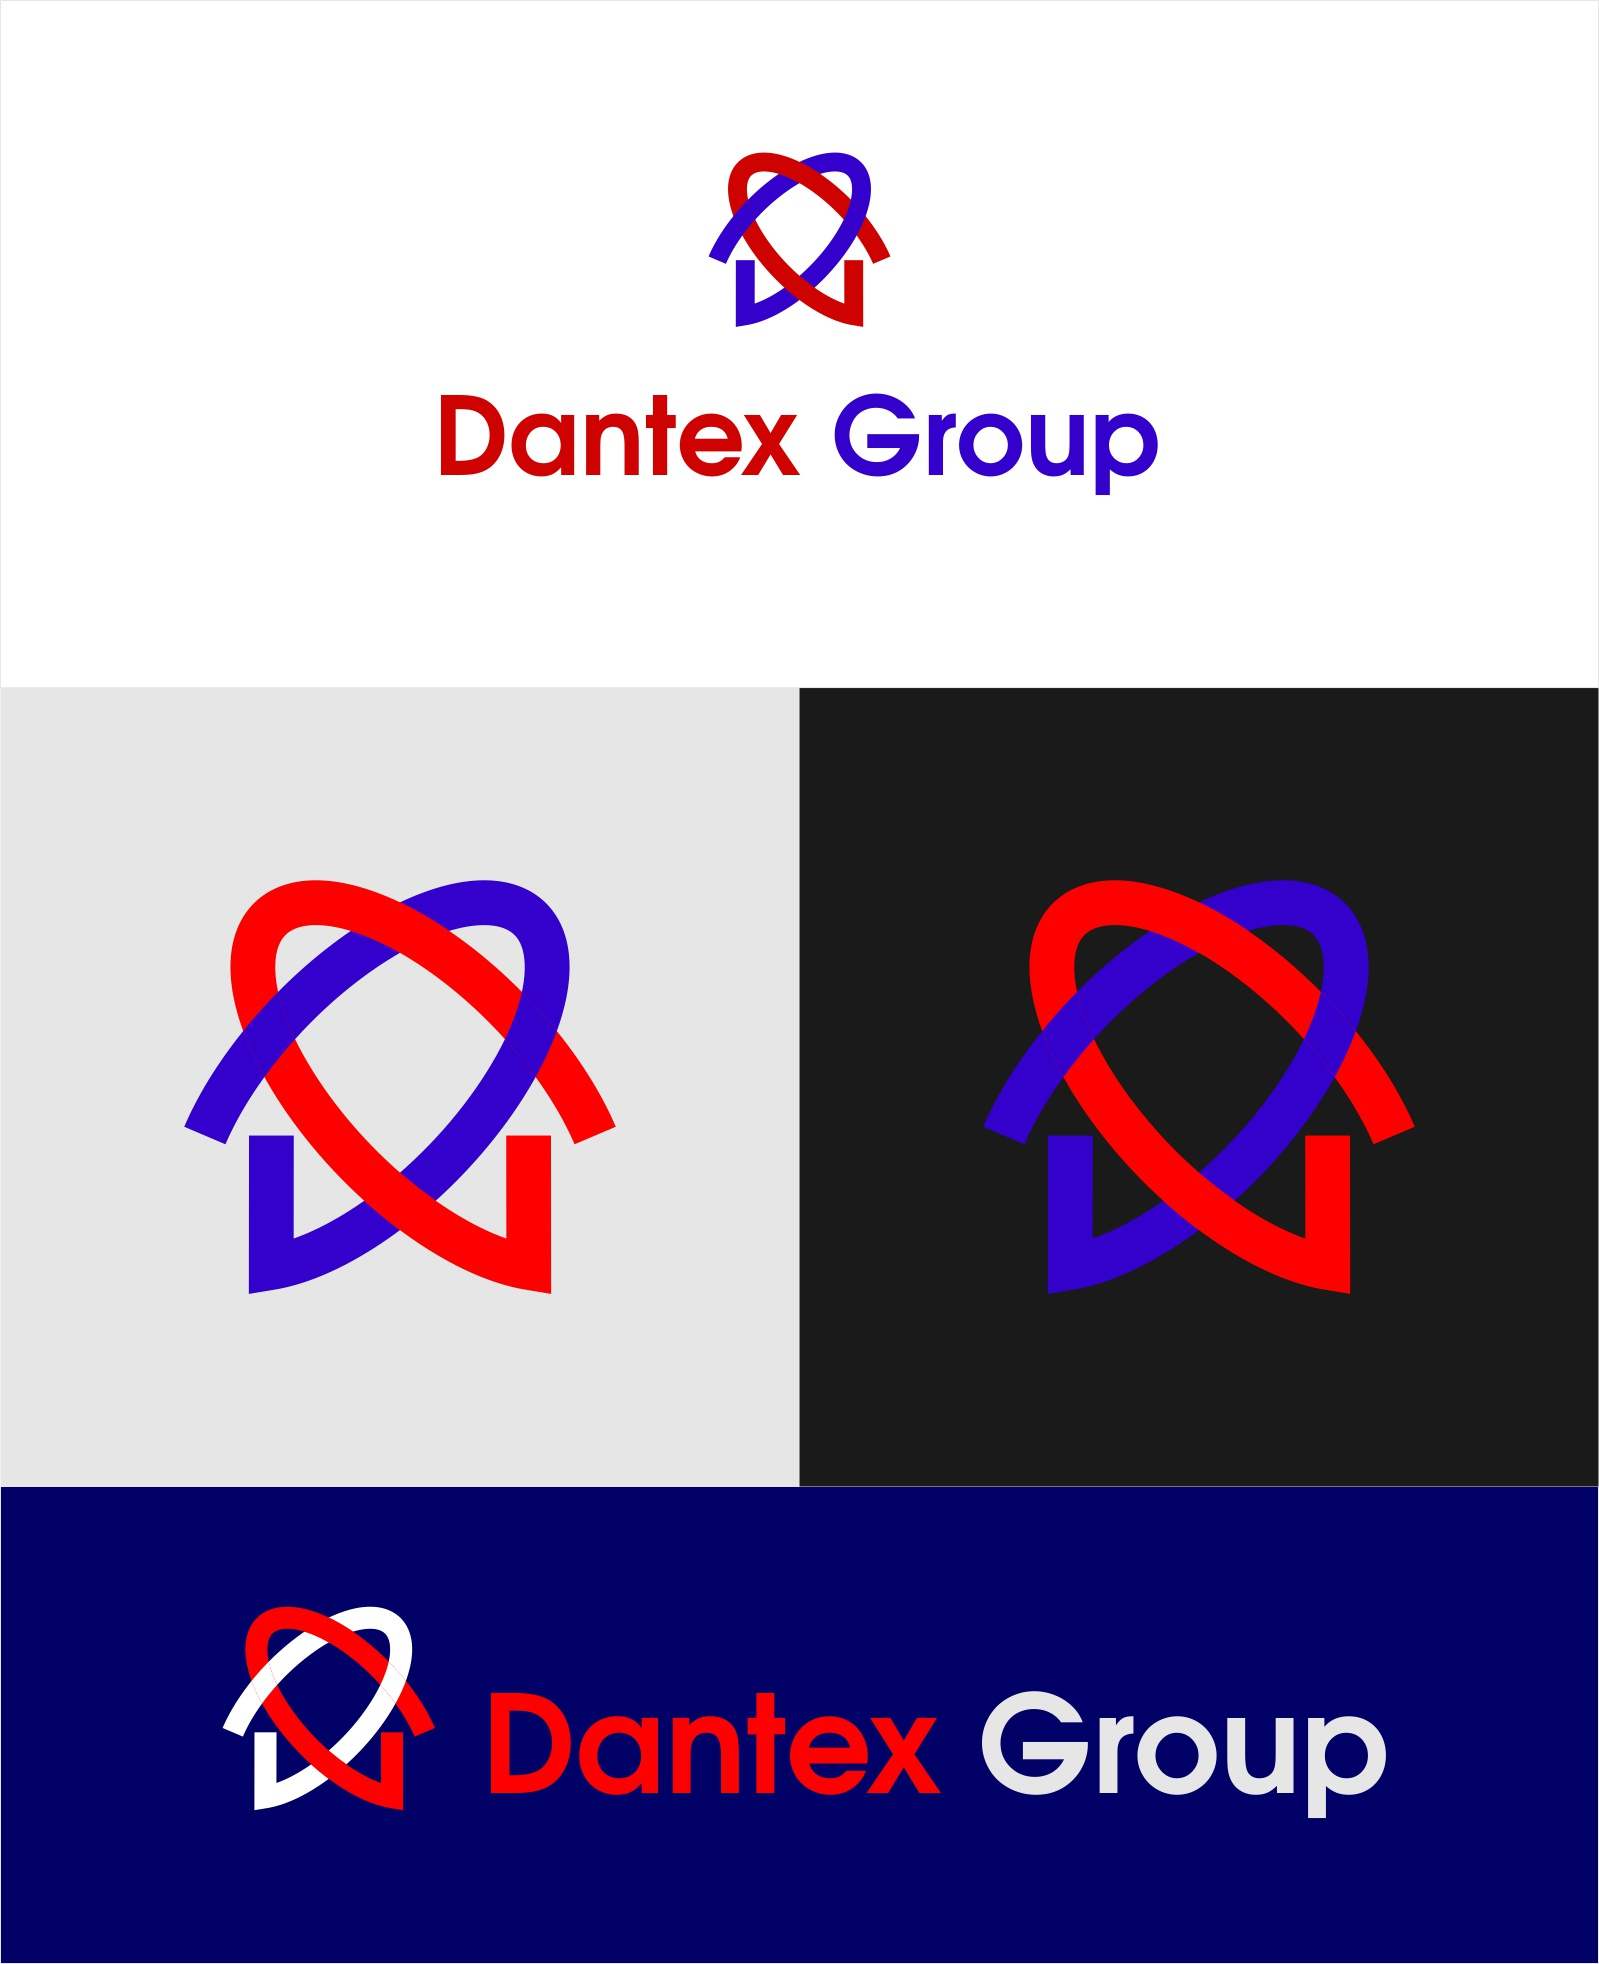 Конкурс на разработку логотипа для компании Dantex Group  фото f_7665c0fe388a924f.jpg